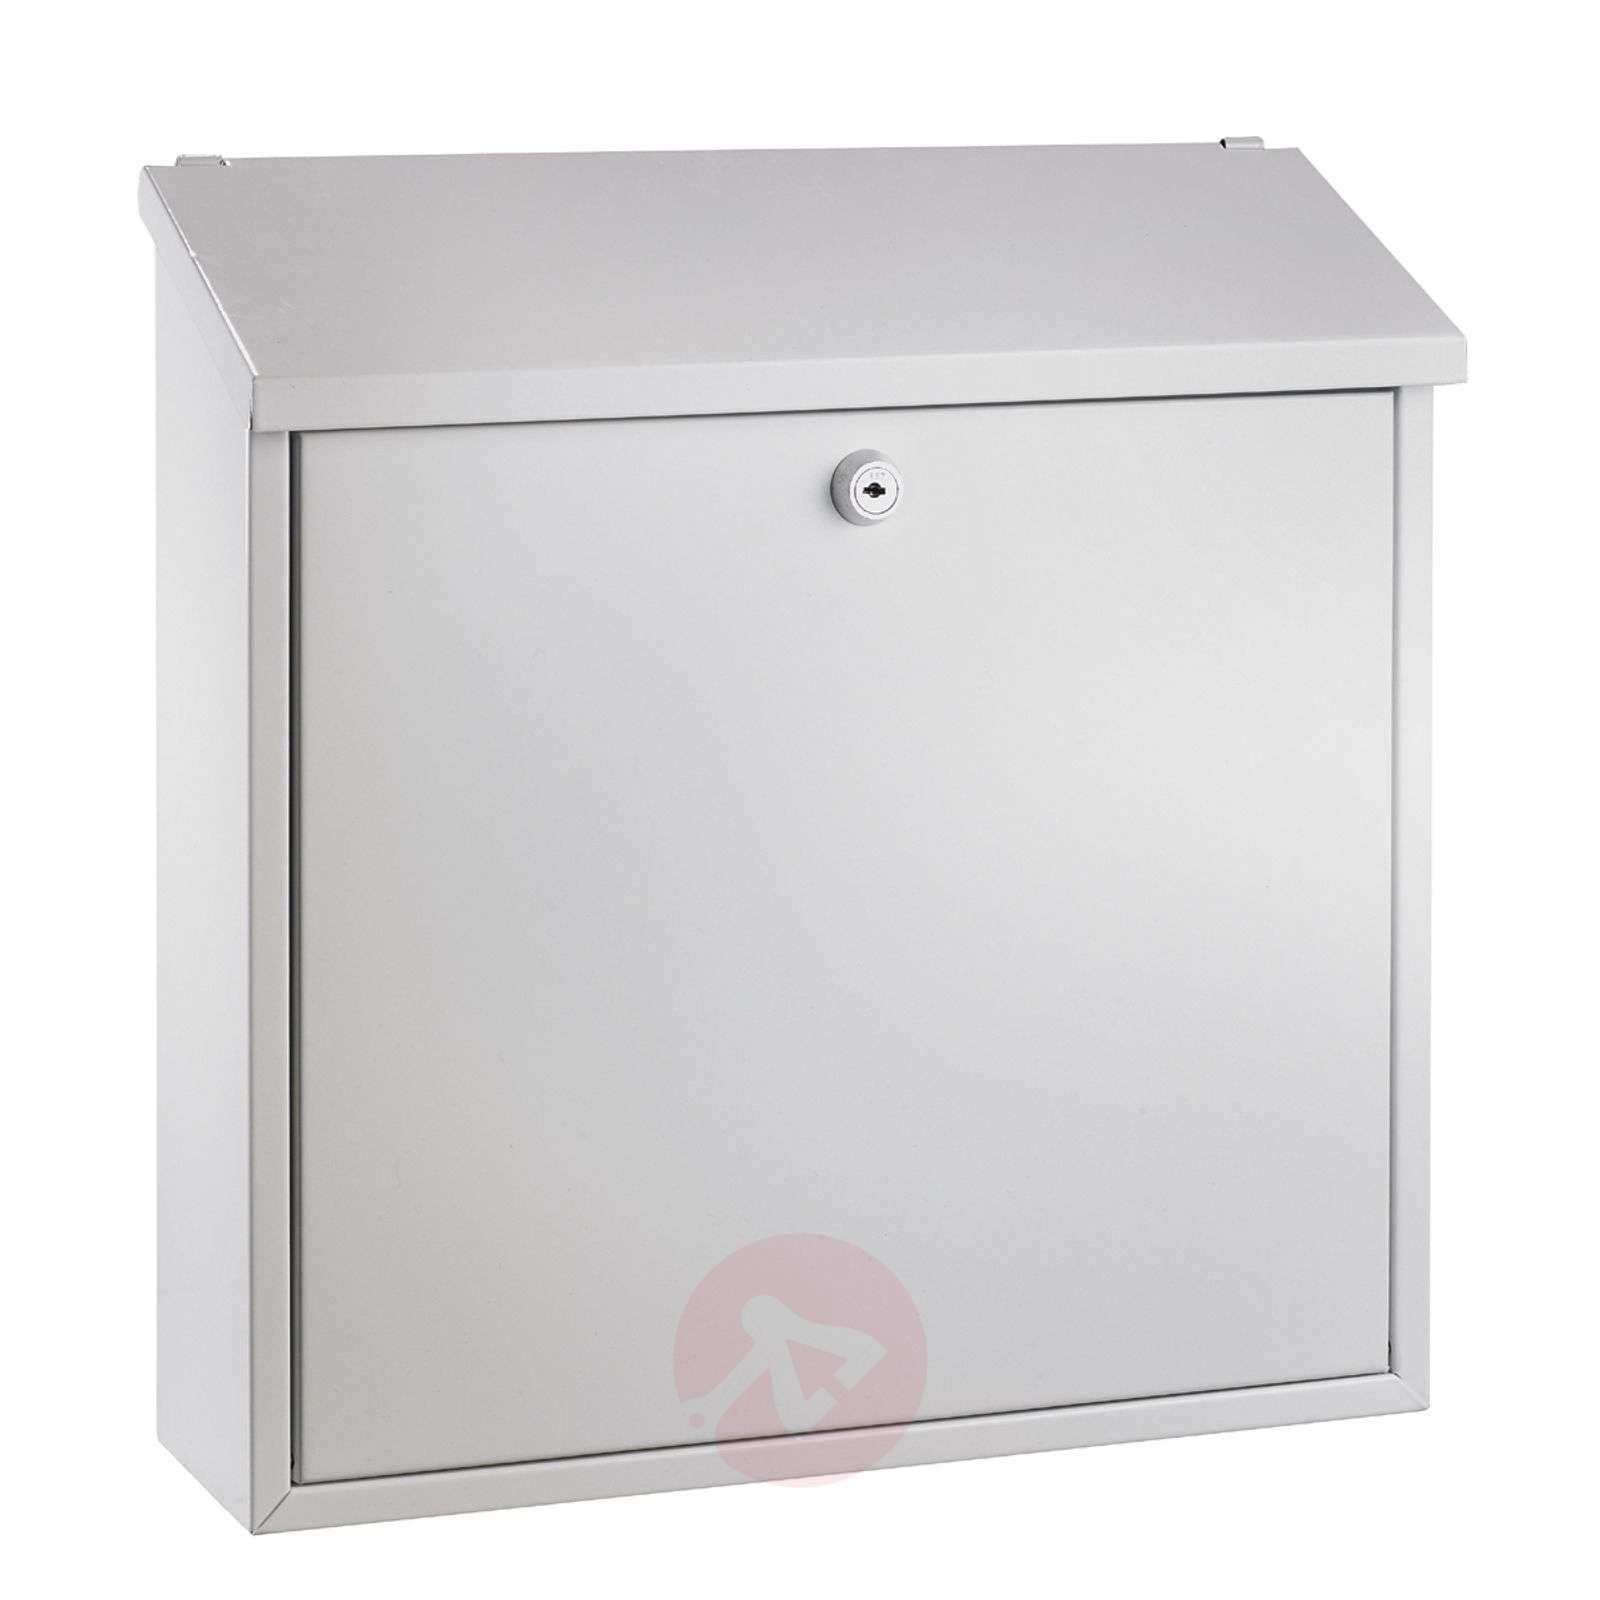 Letterbox Mate white-1003096-01